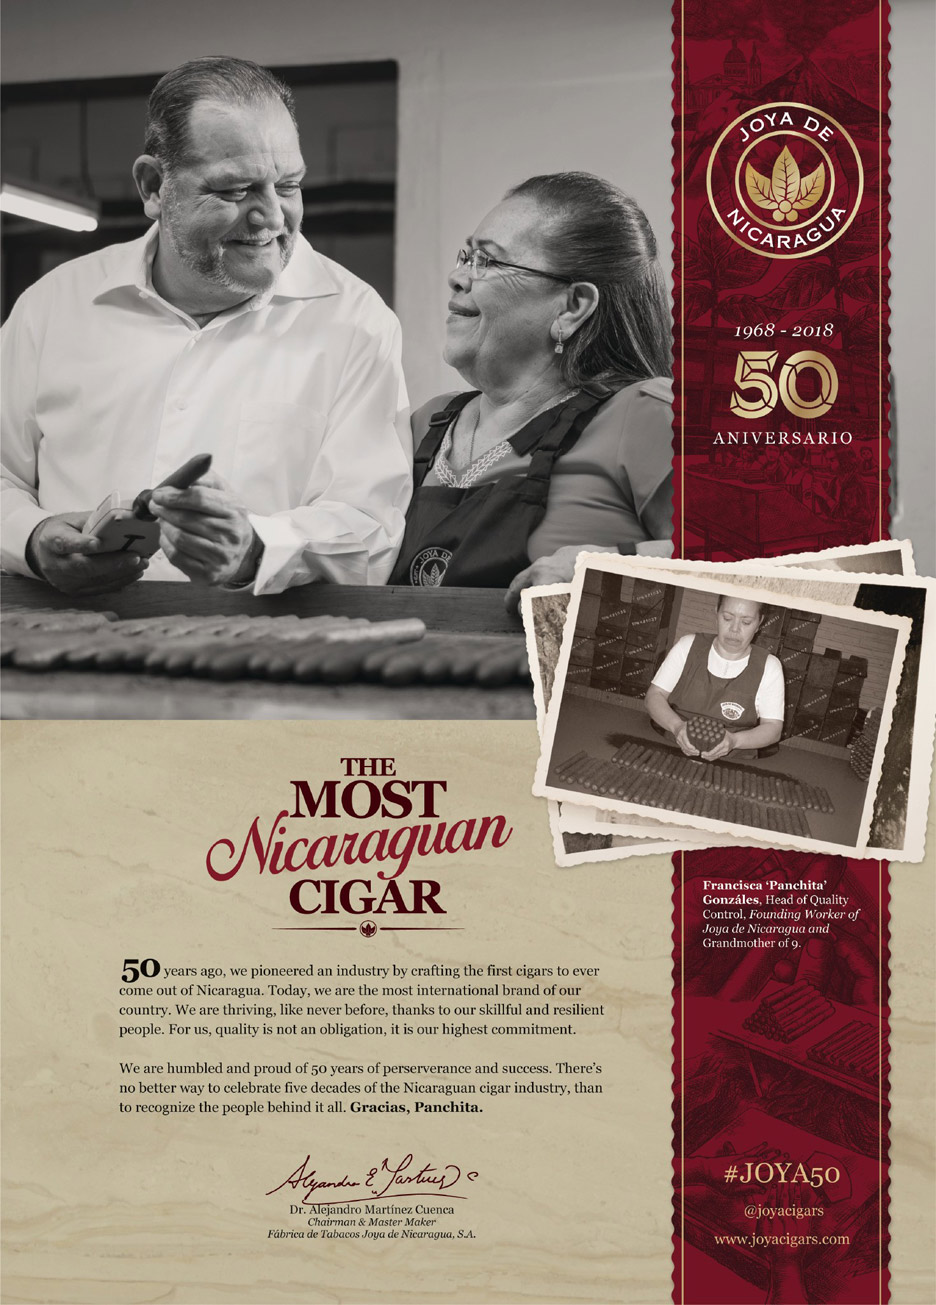 Jubiläum: 50 Jahre Joya de Nicaragua